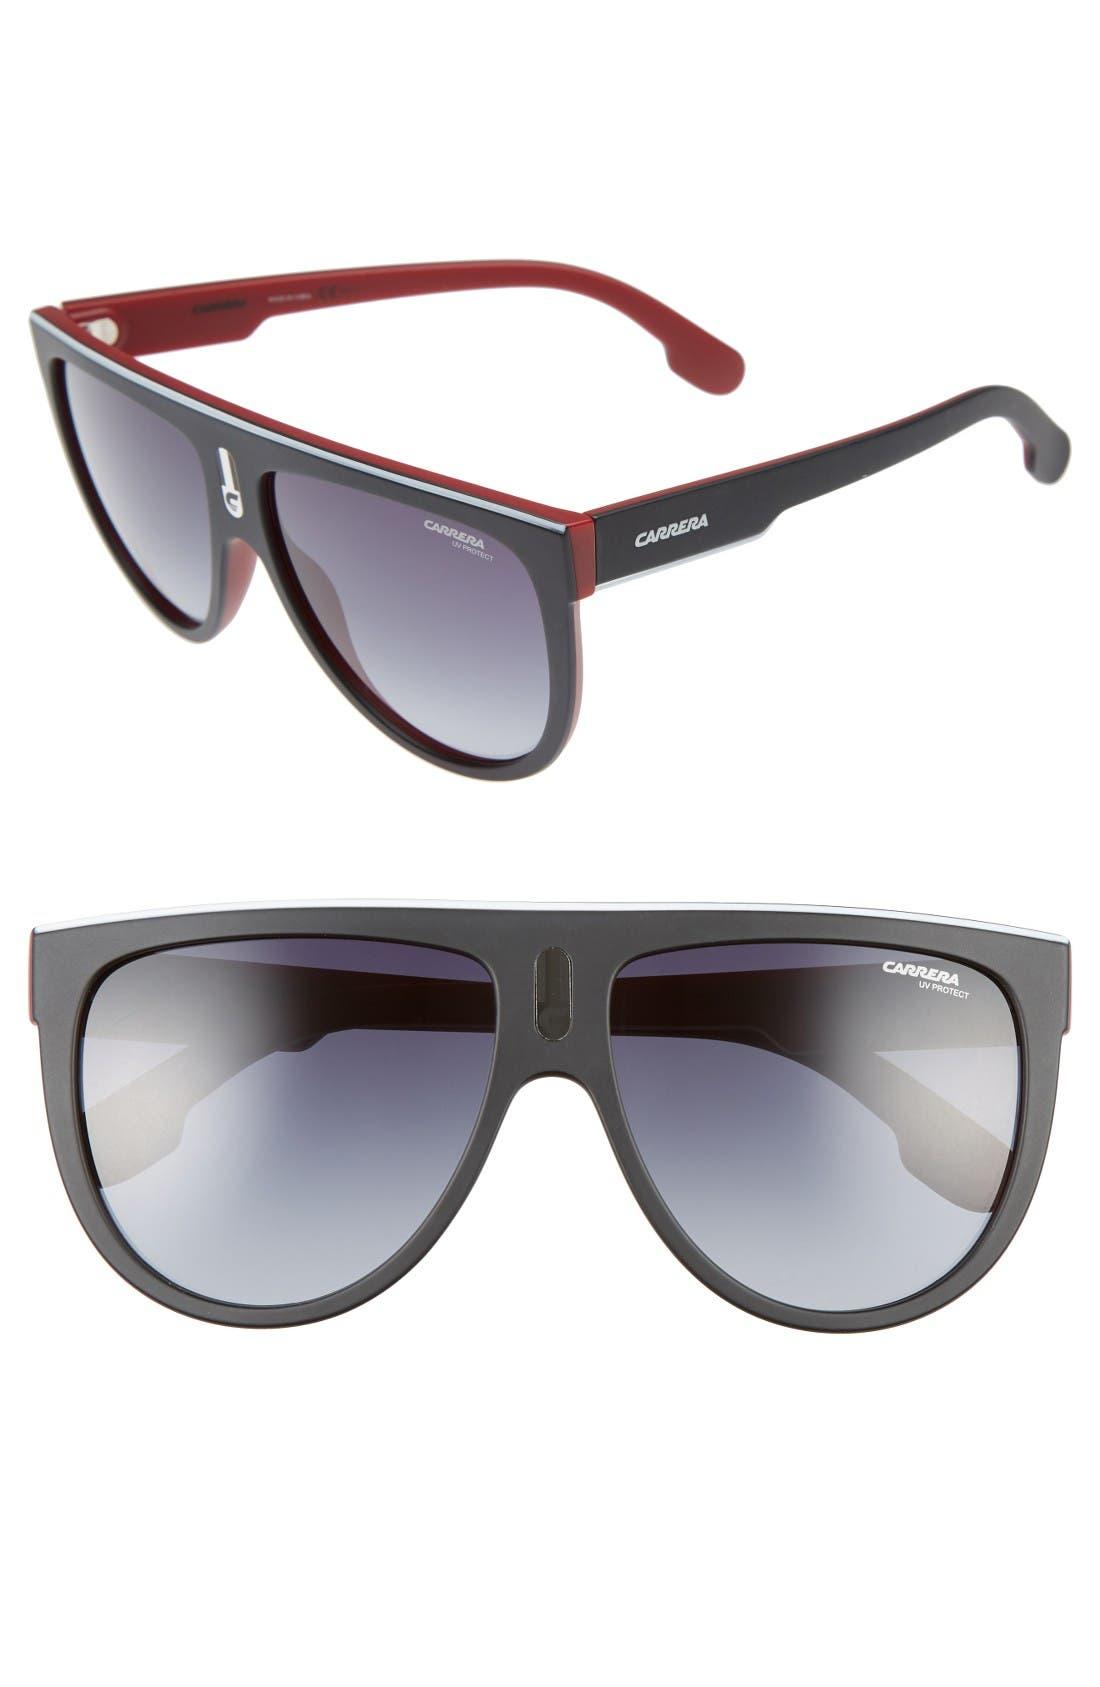 Main Image - Carrera Eyewear 1000/S 60mm Sunglasses